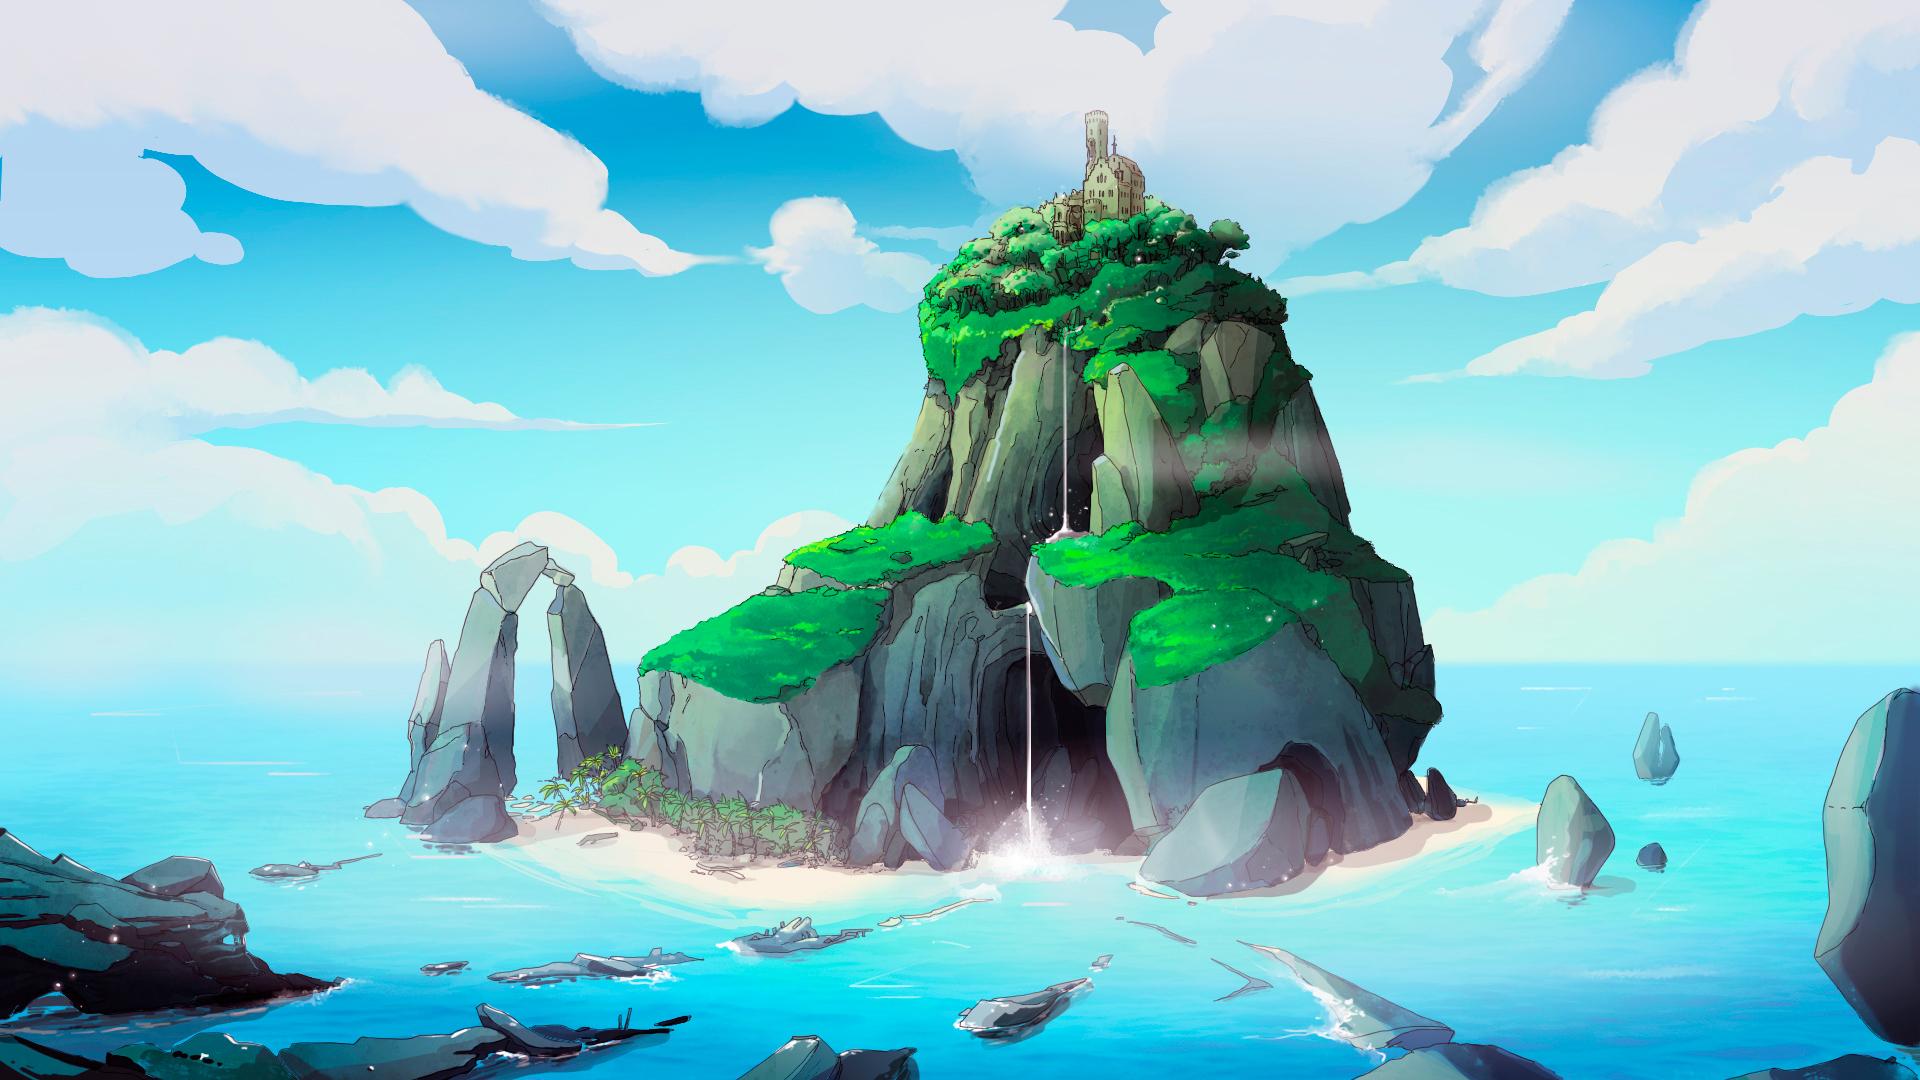 isla maldita